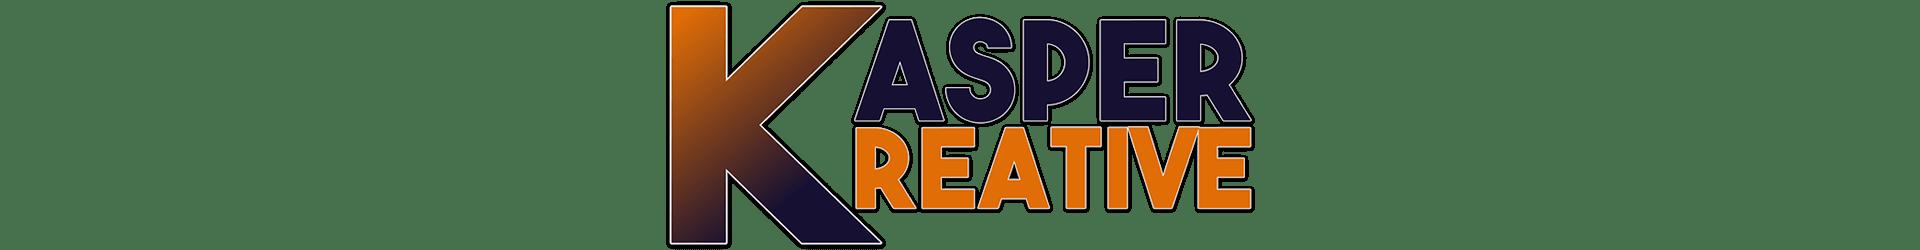 Kasper Kreative